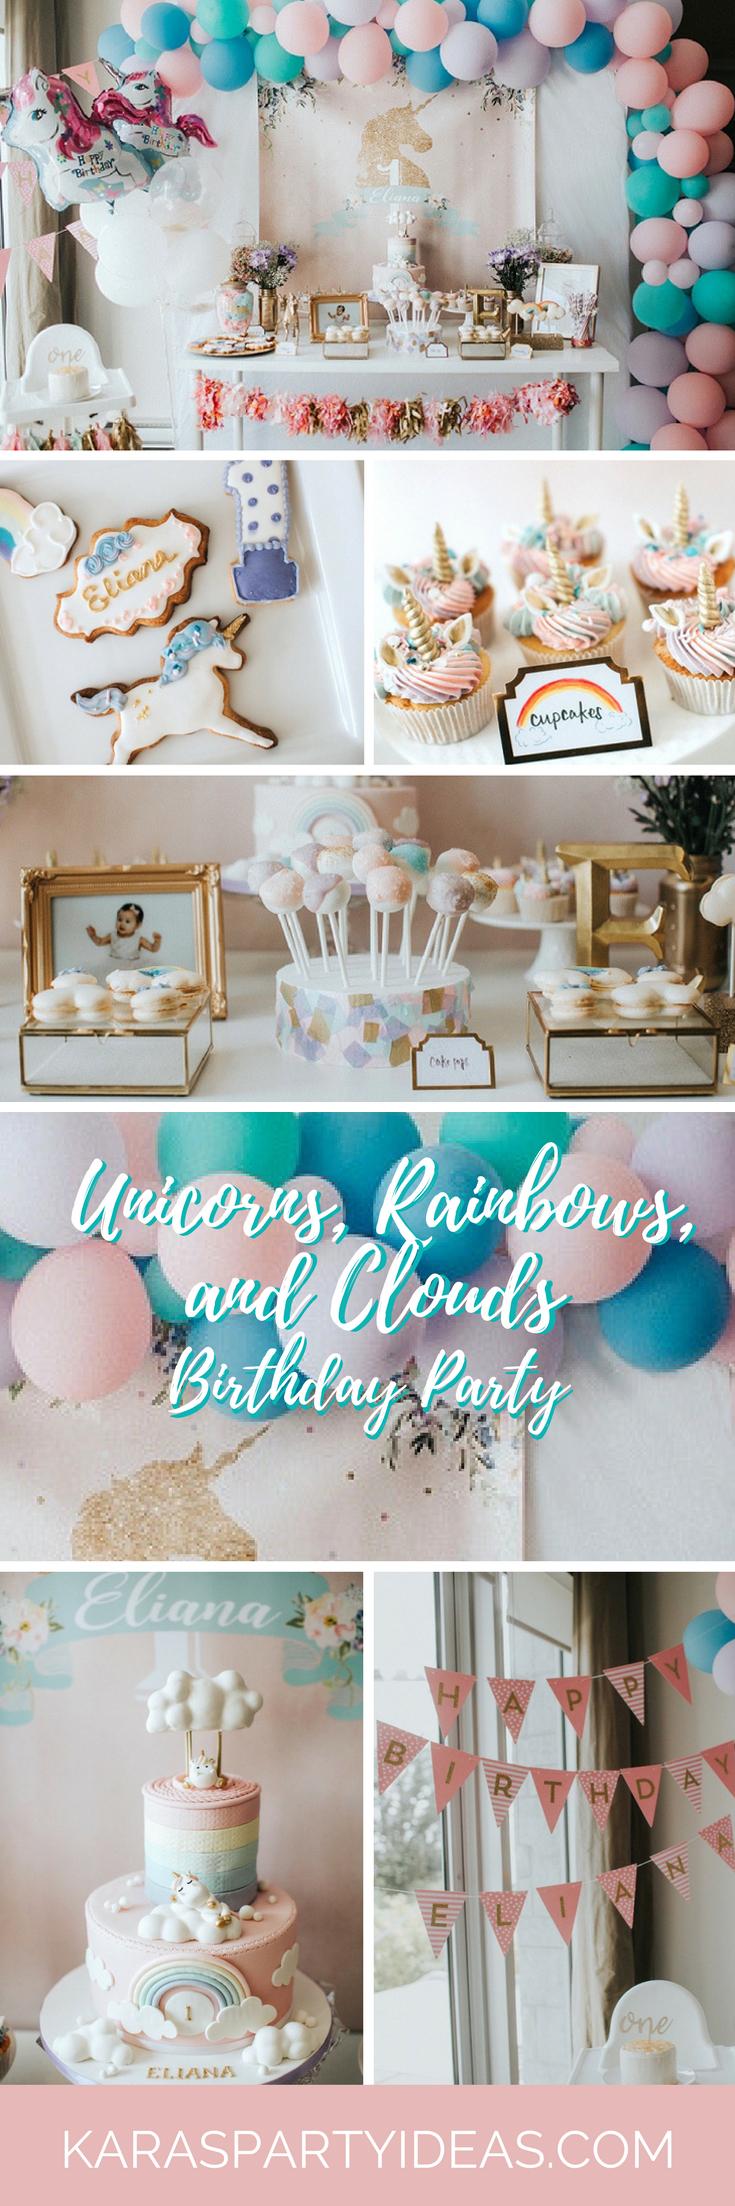 Unicorns Rainbows and Clouds Birthday Party - Karas Party Ideas via KarasPartyIdeas.com